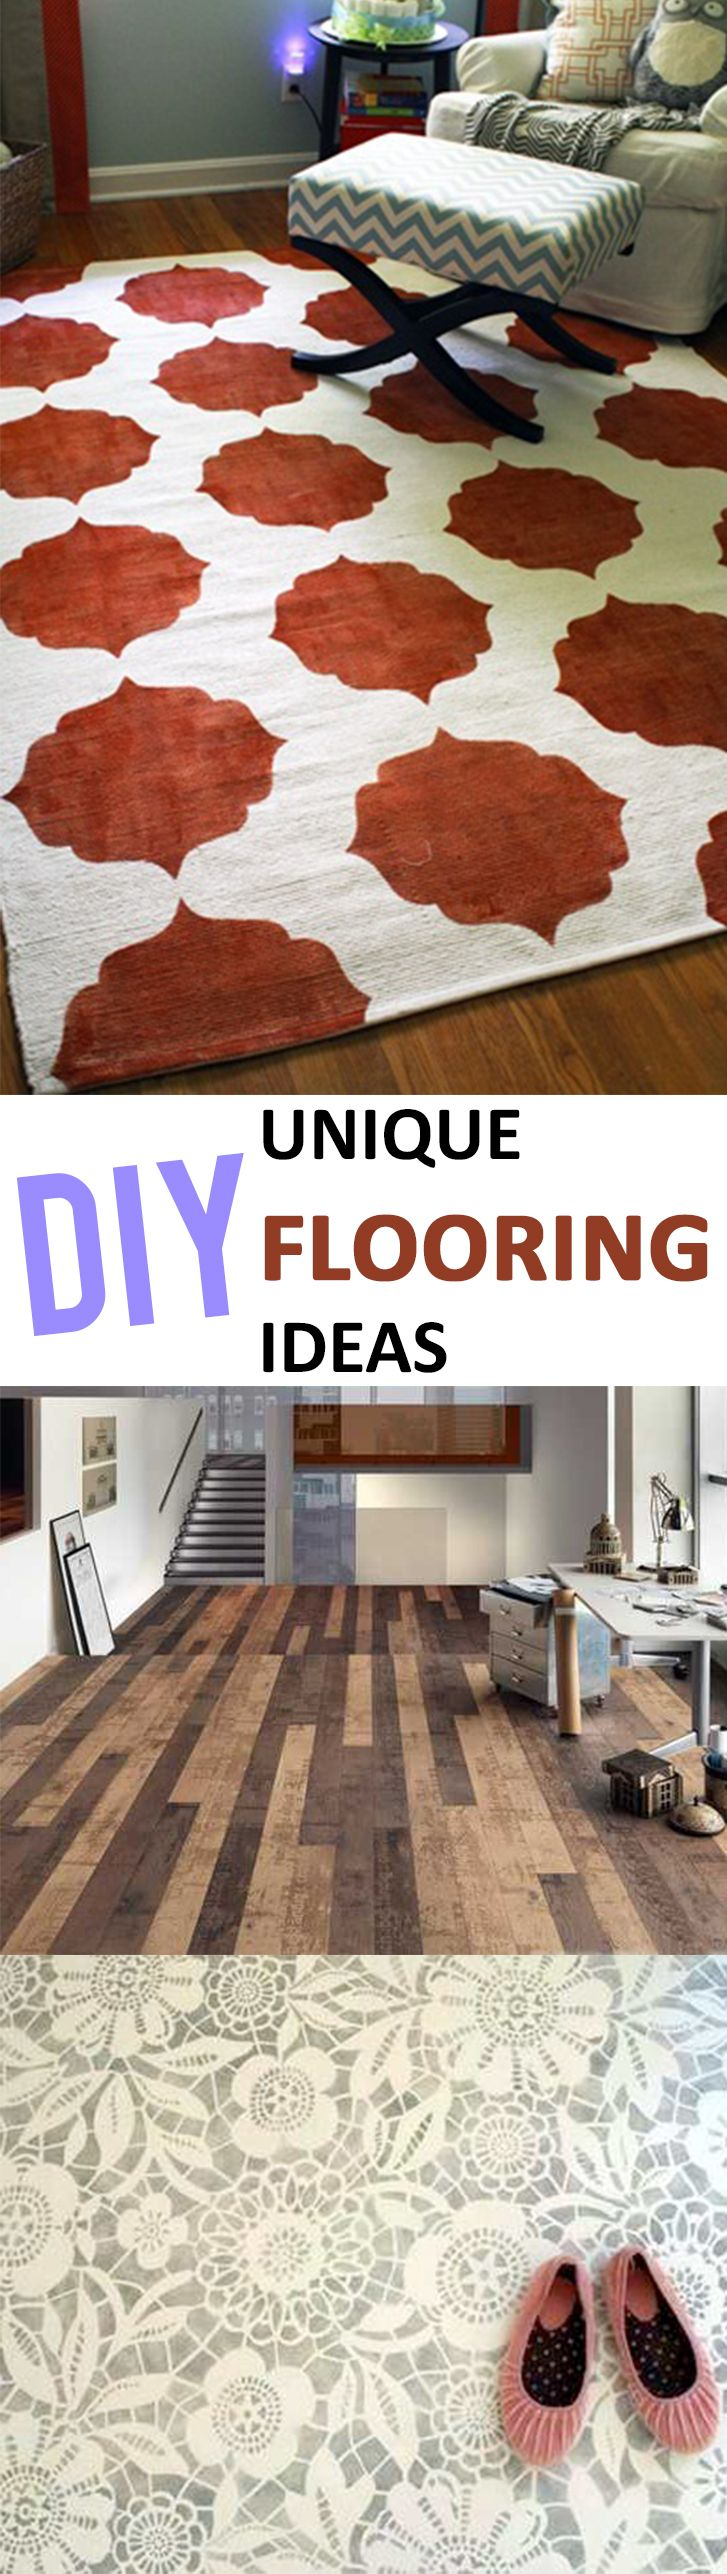 best 25 stencil rug ideas on pinterest stenciled floor. Black Bedroom Furniture Sets. Home Design Ideas